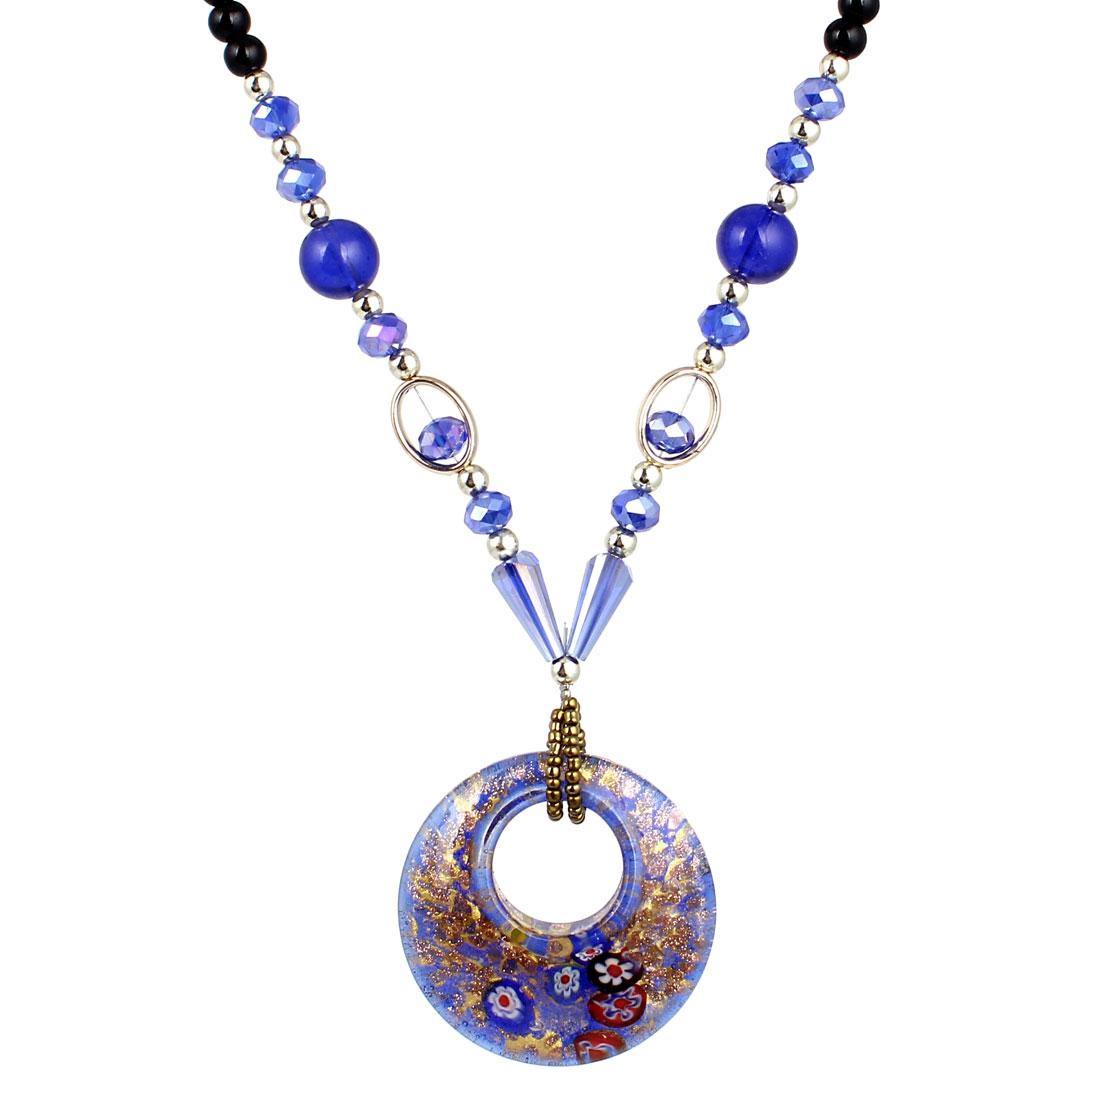 Indigo Blue Black Plastic Beaded Neck String Double Round Shape Glass Pendant Necklace for Lady